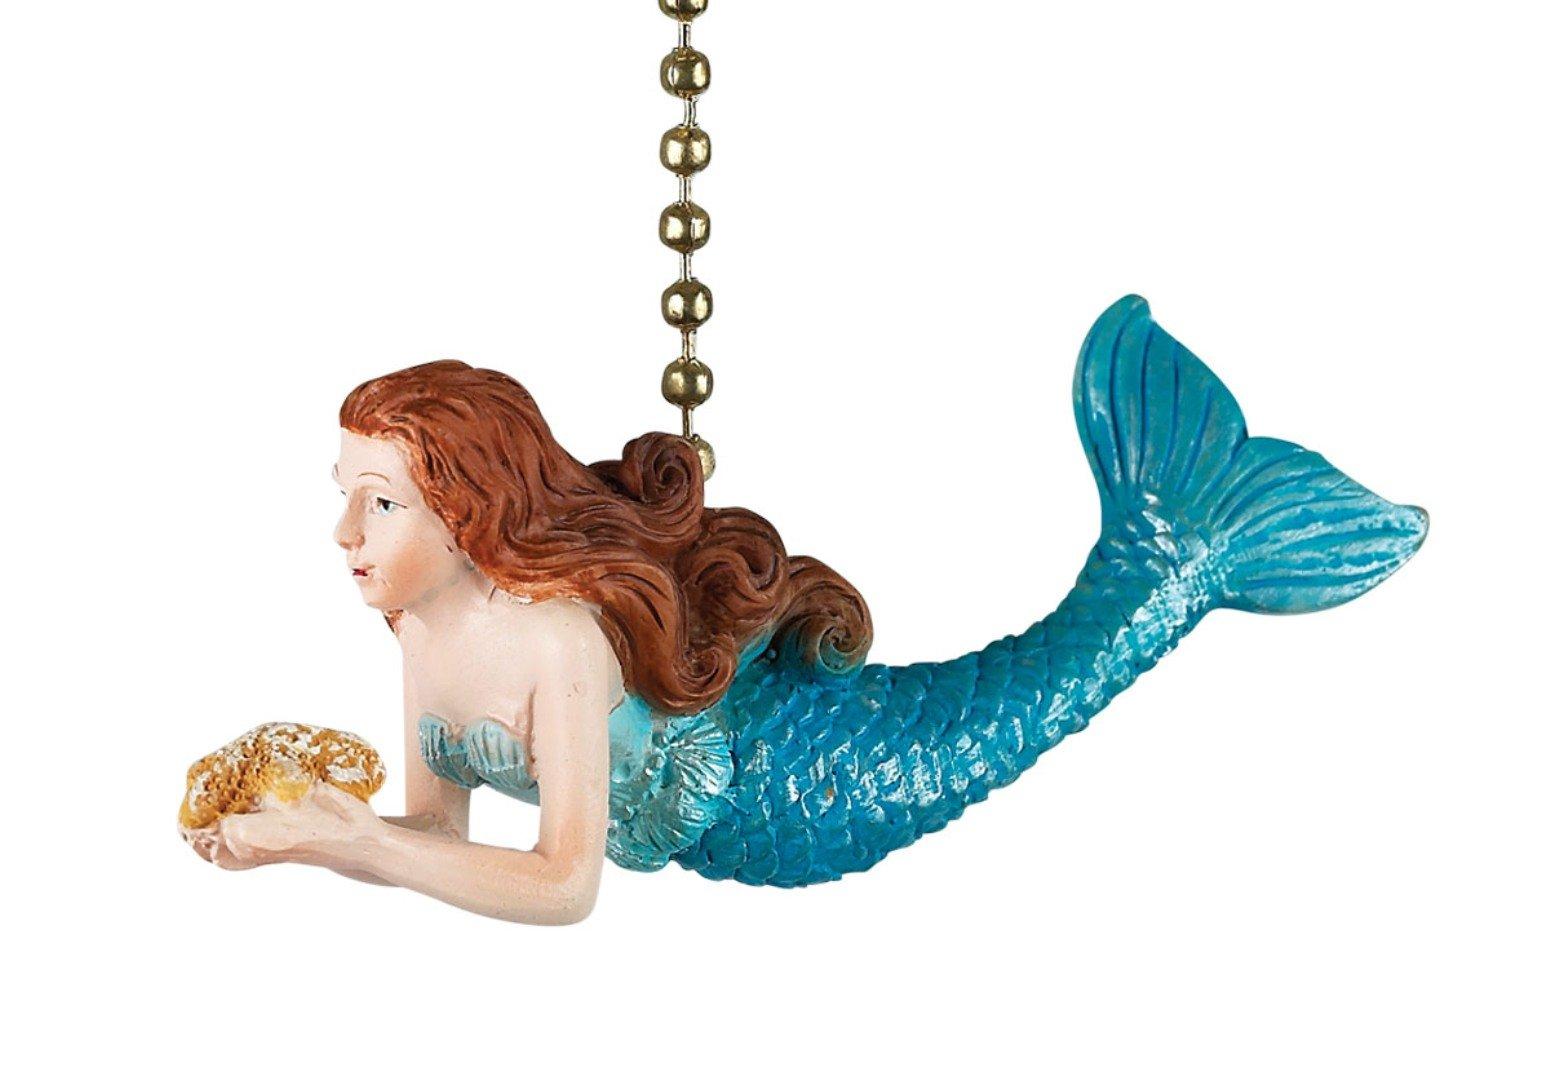 Ocean Mermaid Decorative Ceiling Fan Light Dimensional Pull Clementine Design